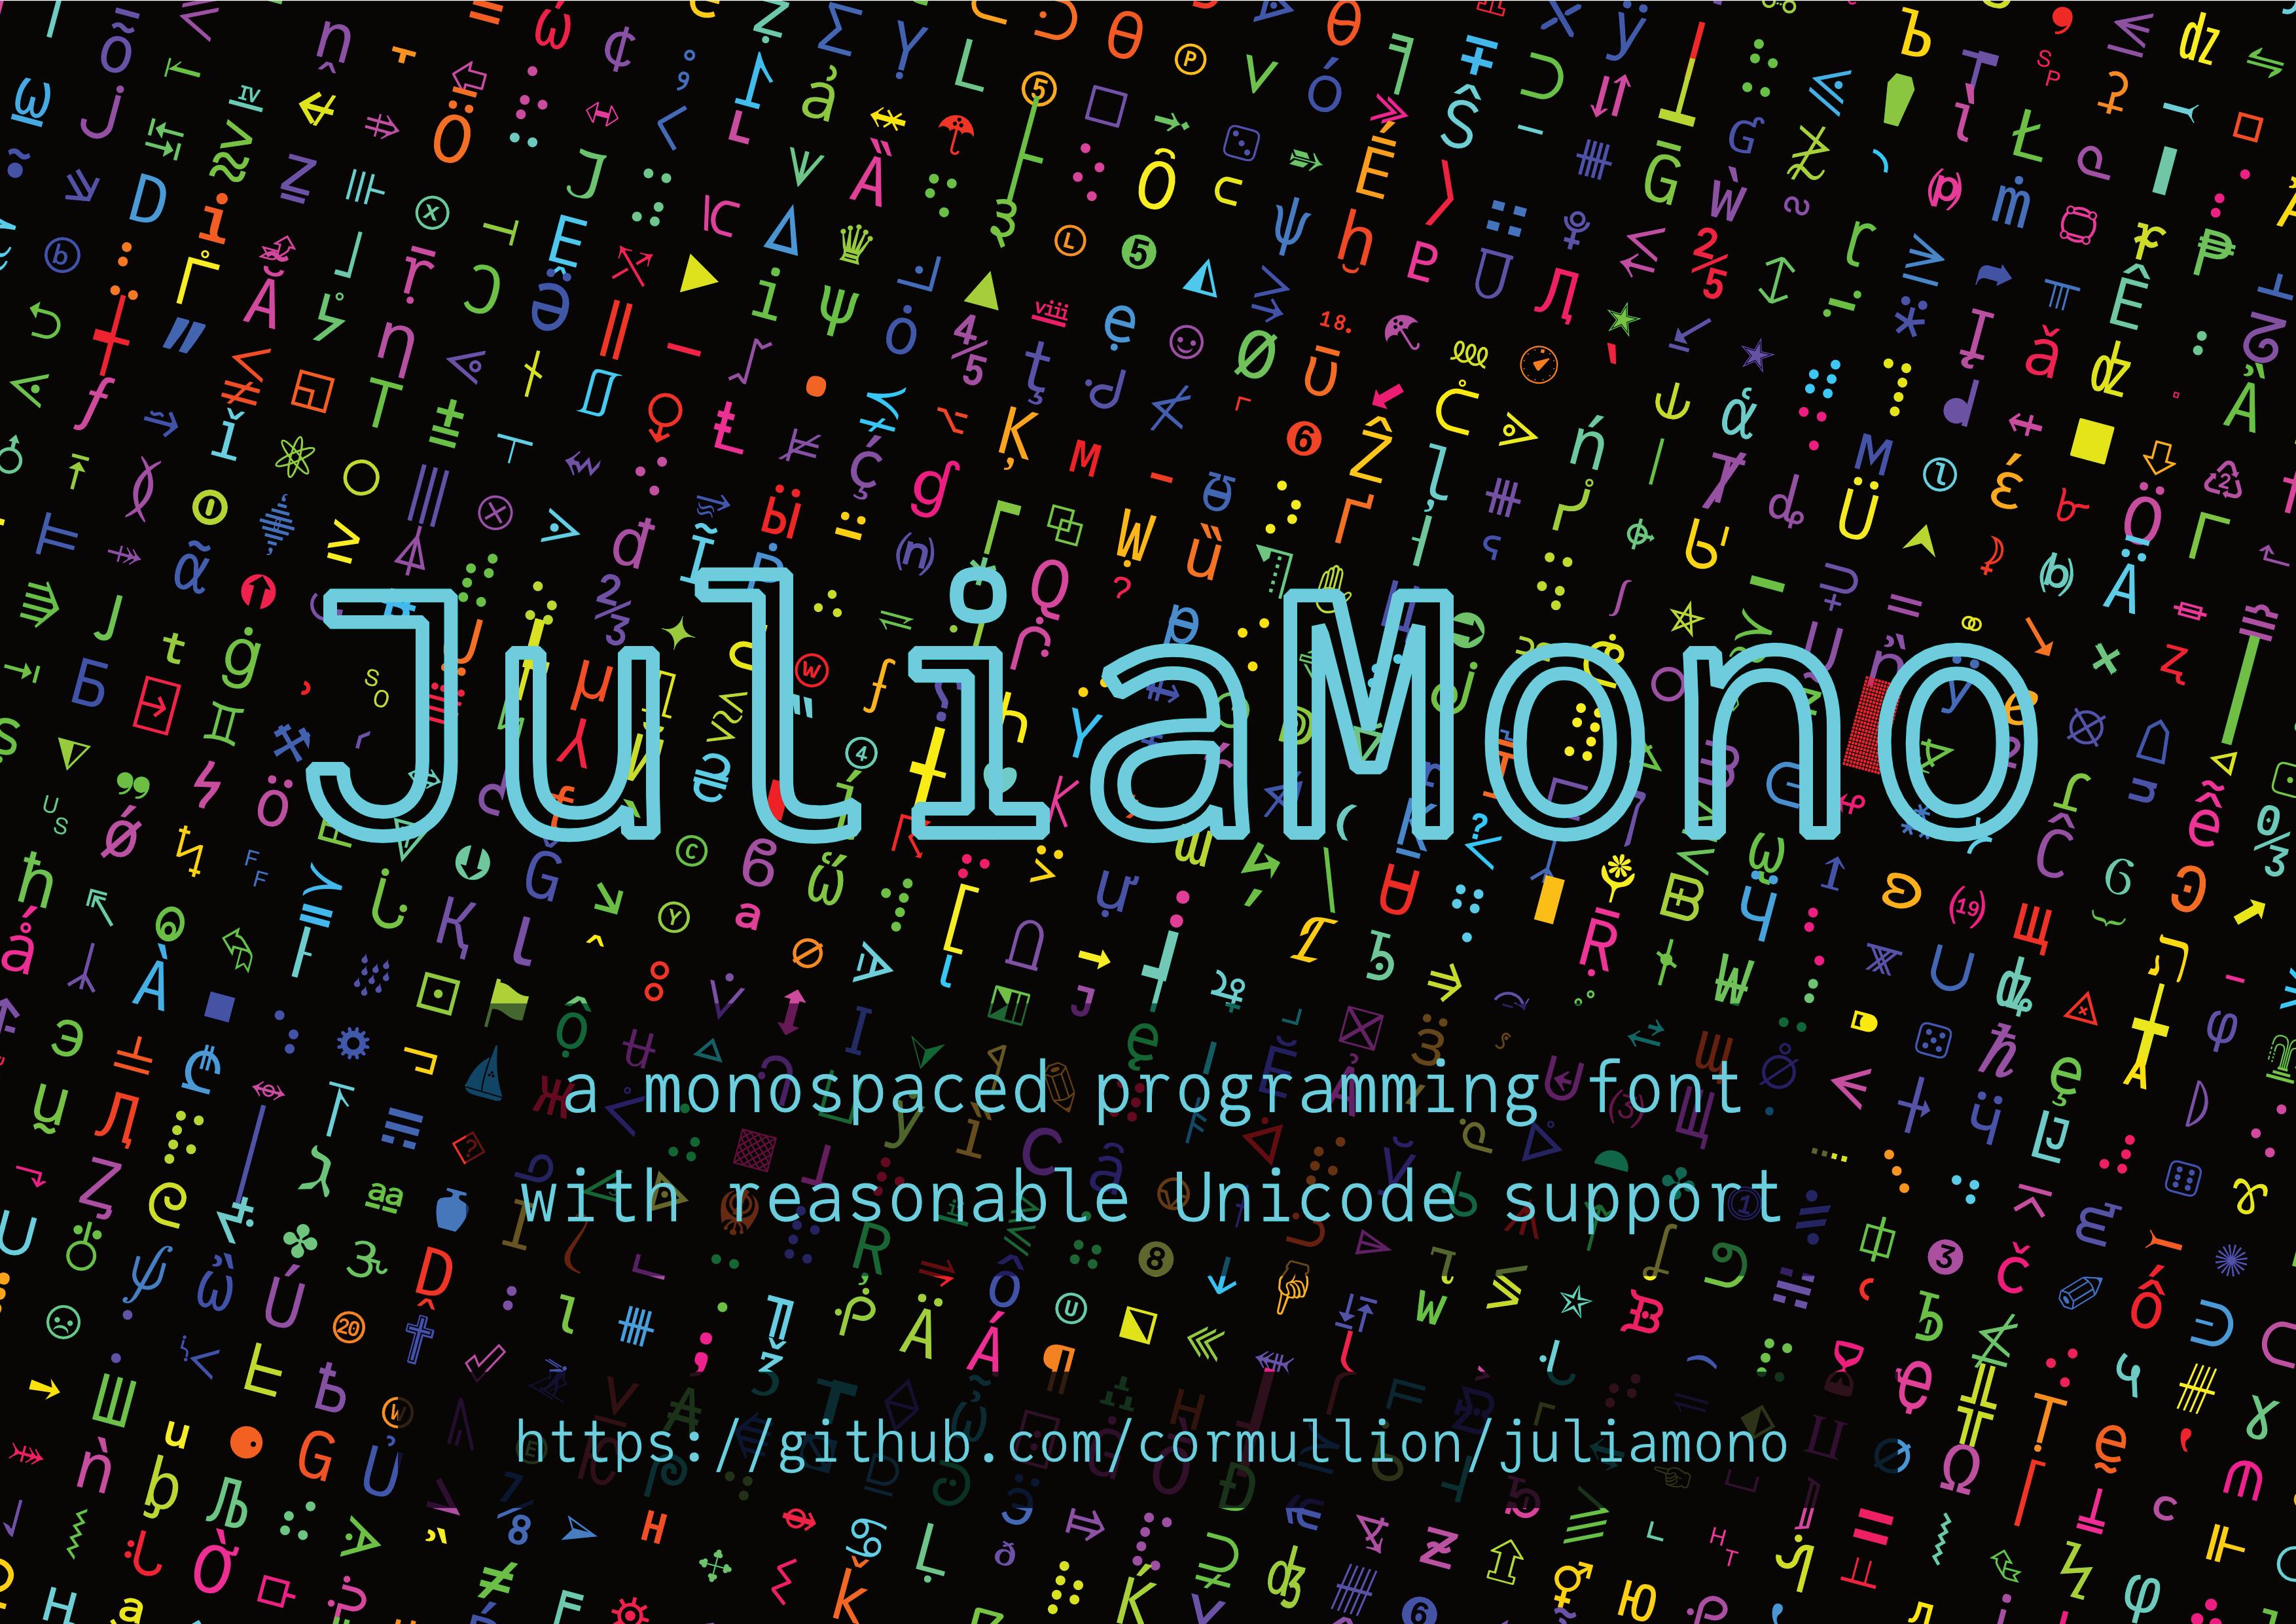 Juliamono